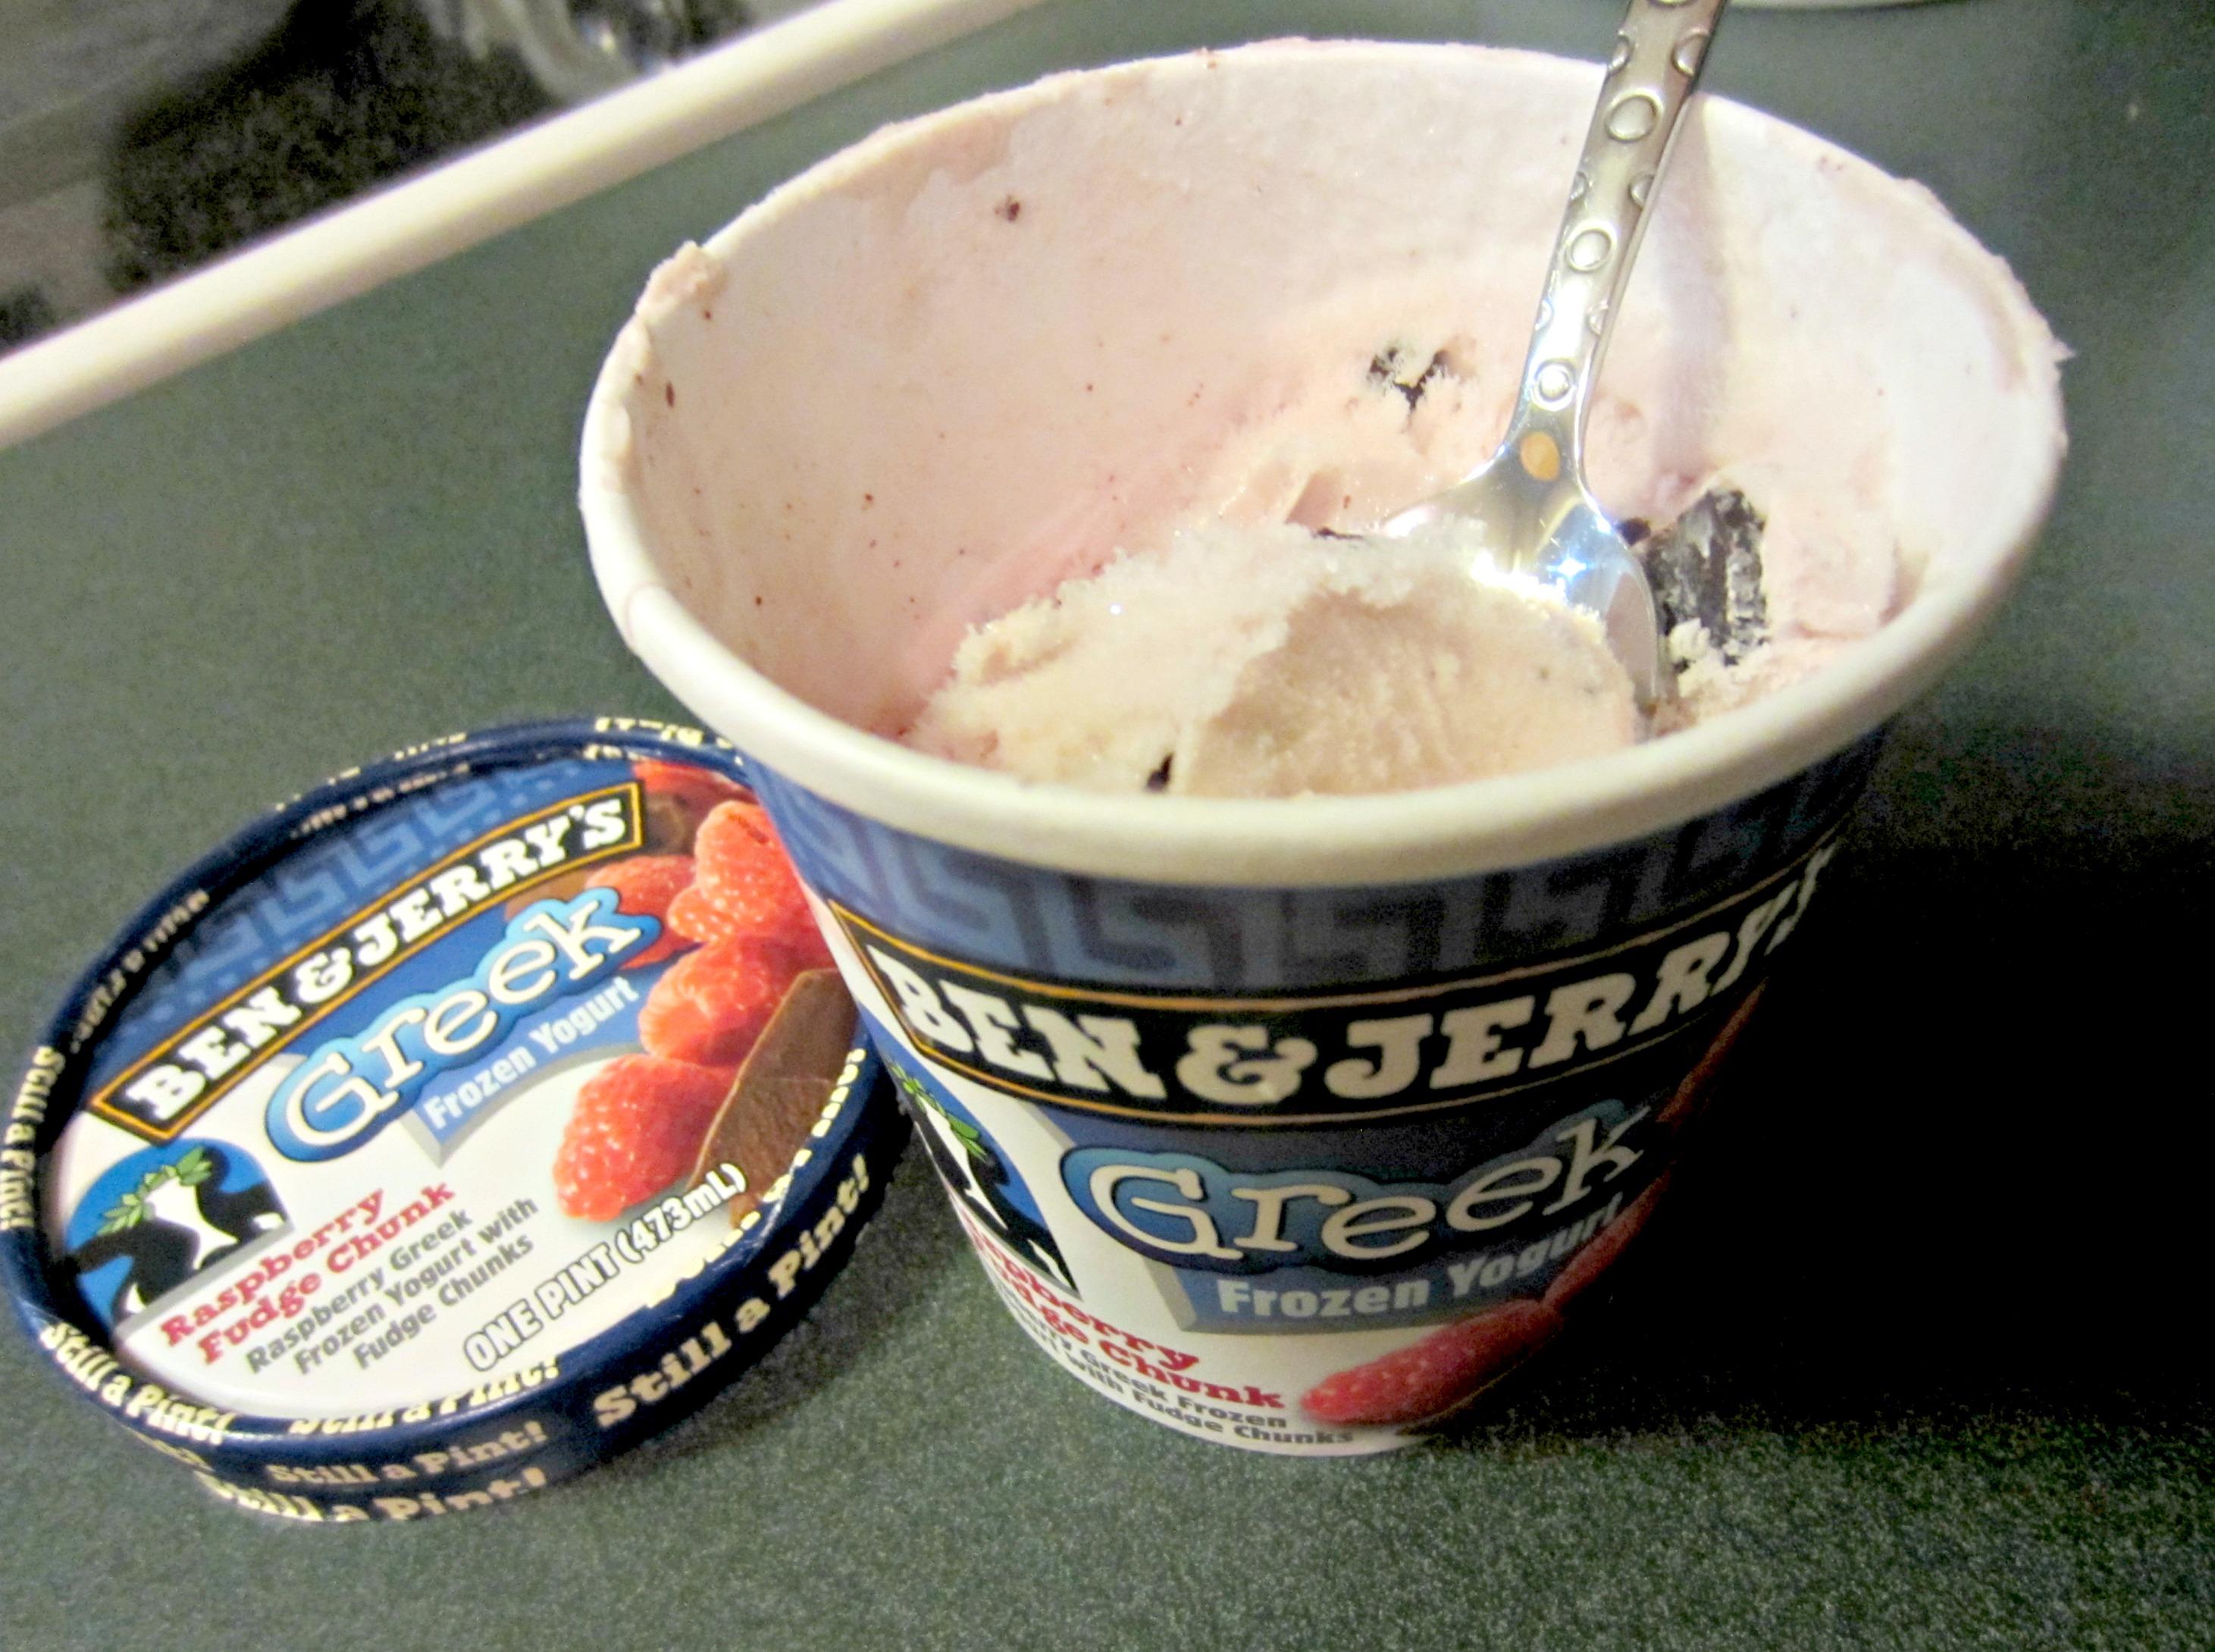 Ben & Jerry's Greek Frozen Yogurt